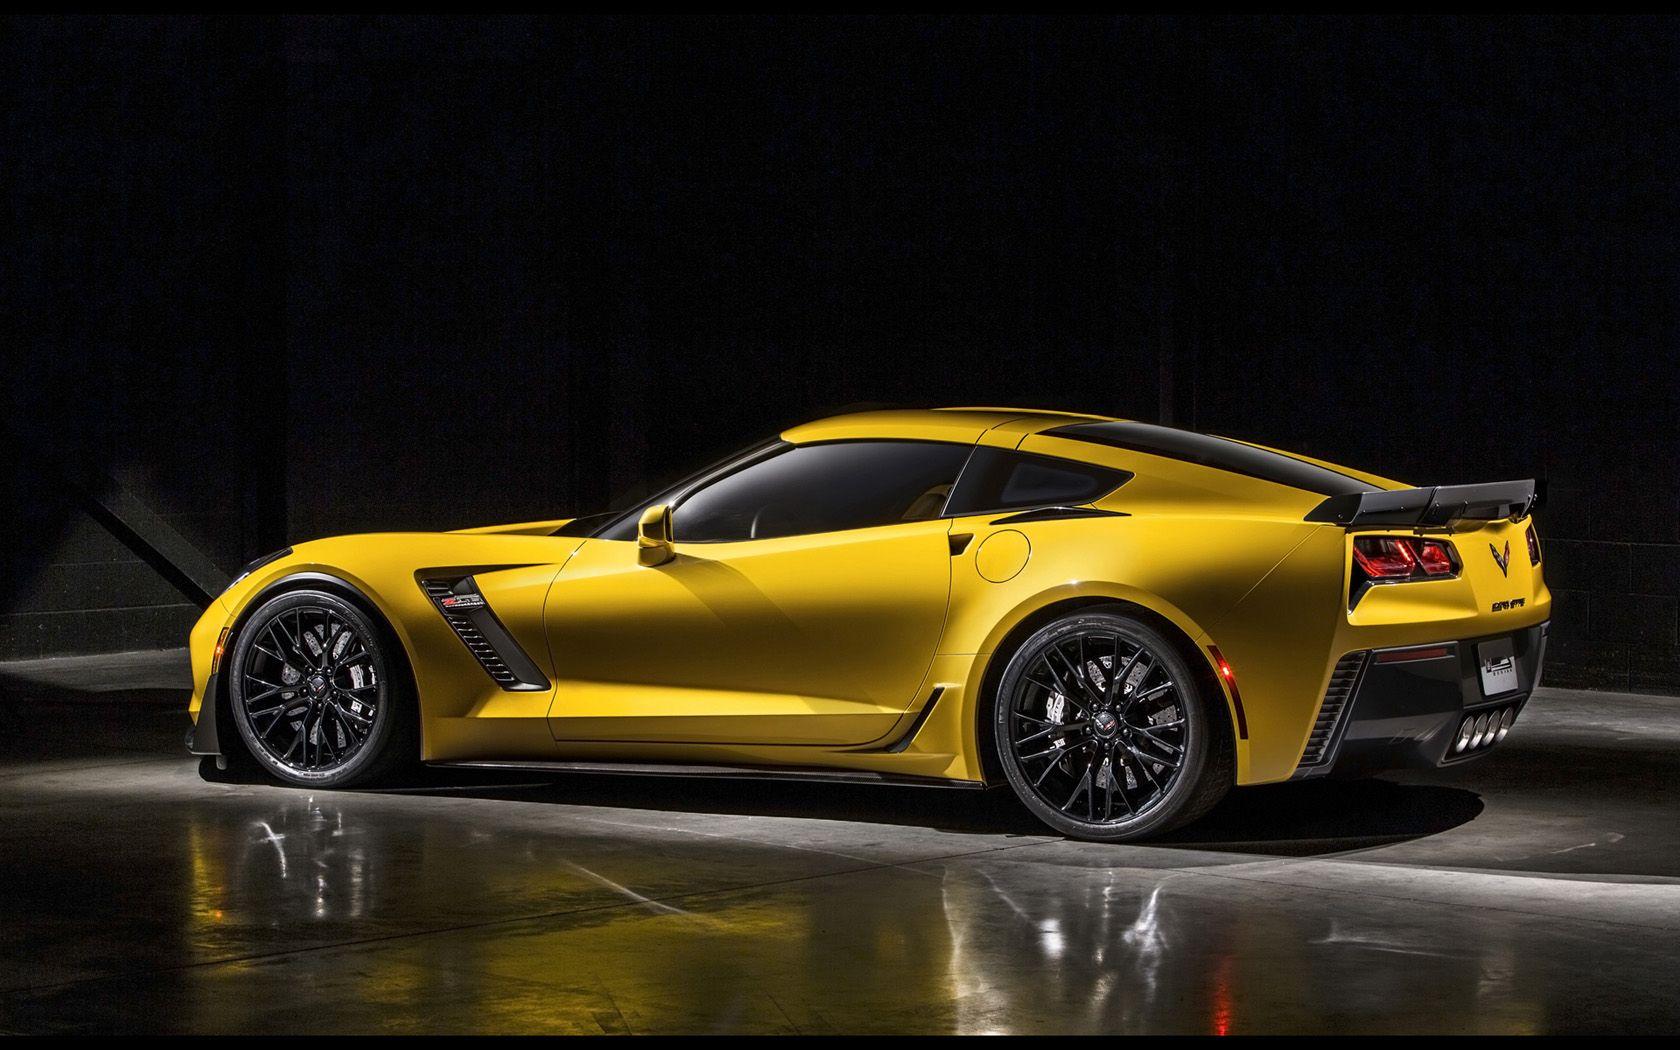 2015 Corvette Stingray Z06 Chevrolet Corvette Z06 Chevrolet Corvette Corvette Z06